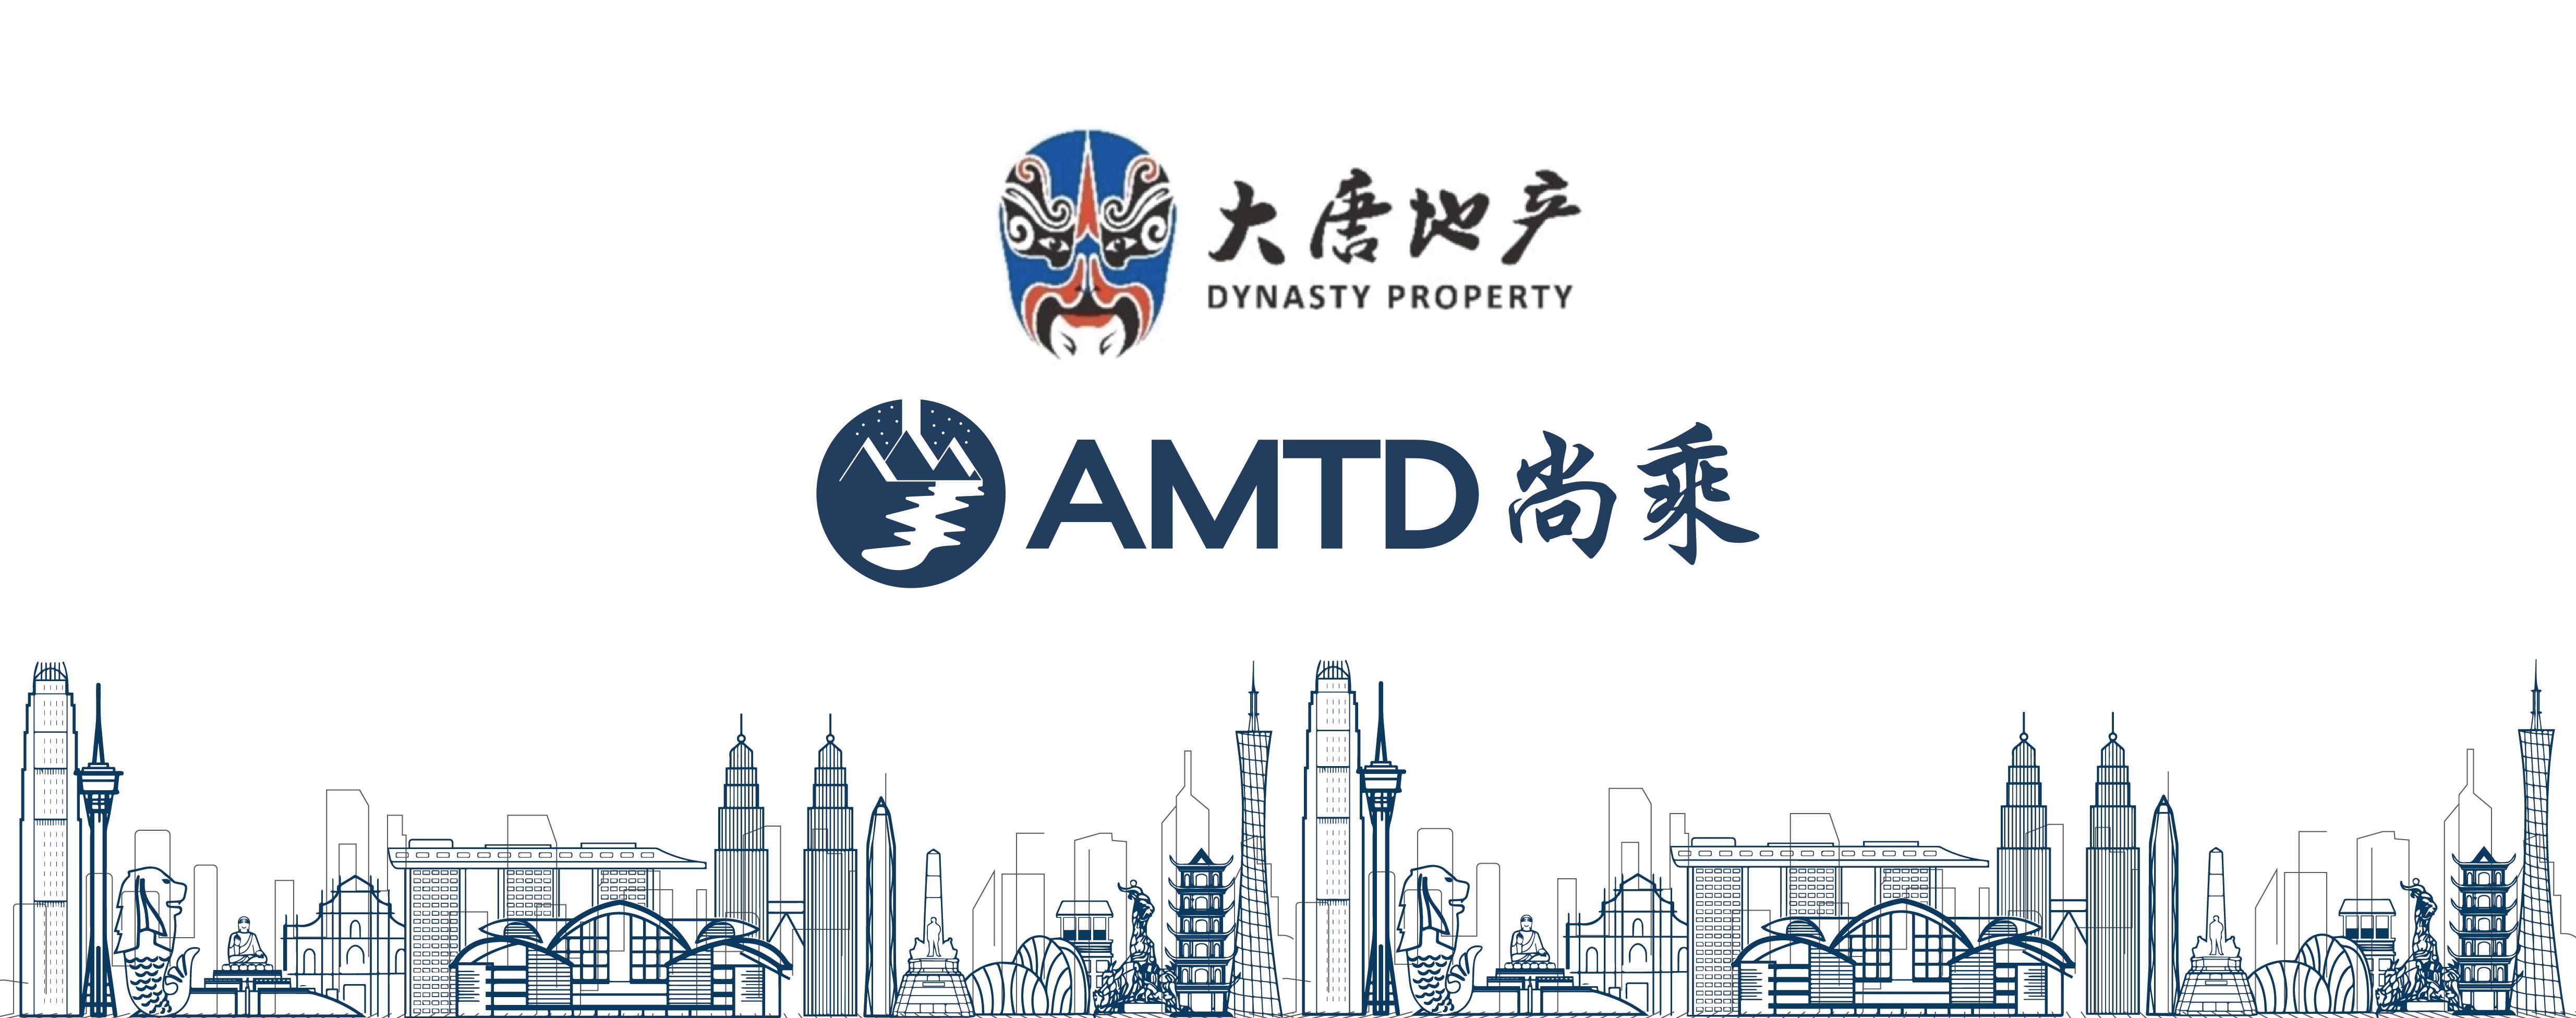 AMTD Deals | Datang Group's US$300m 12.5% 364-Day Senior Bond Debut Offering